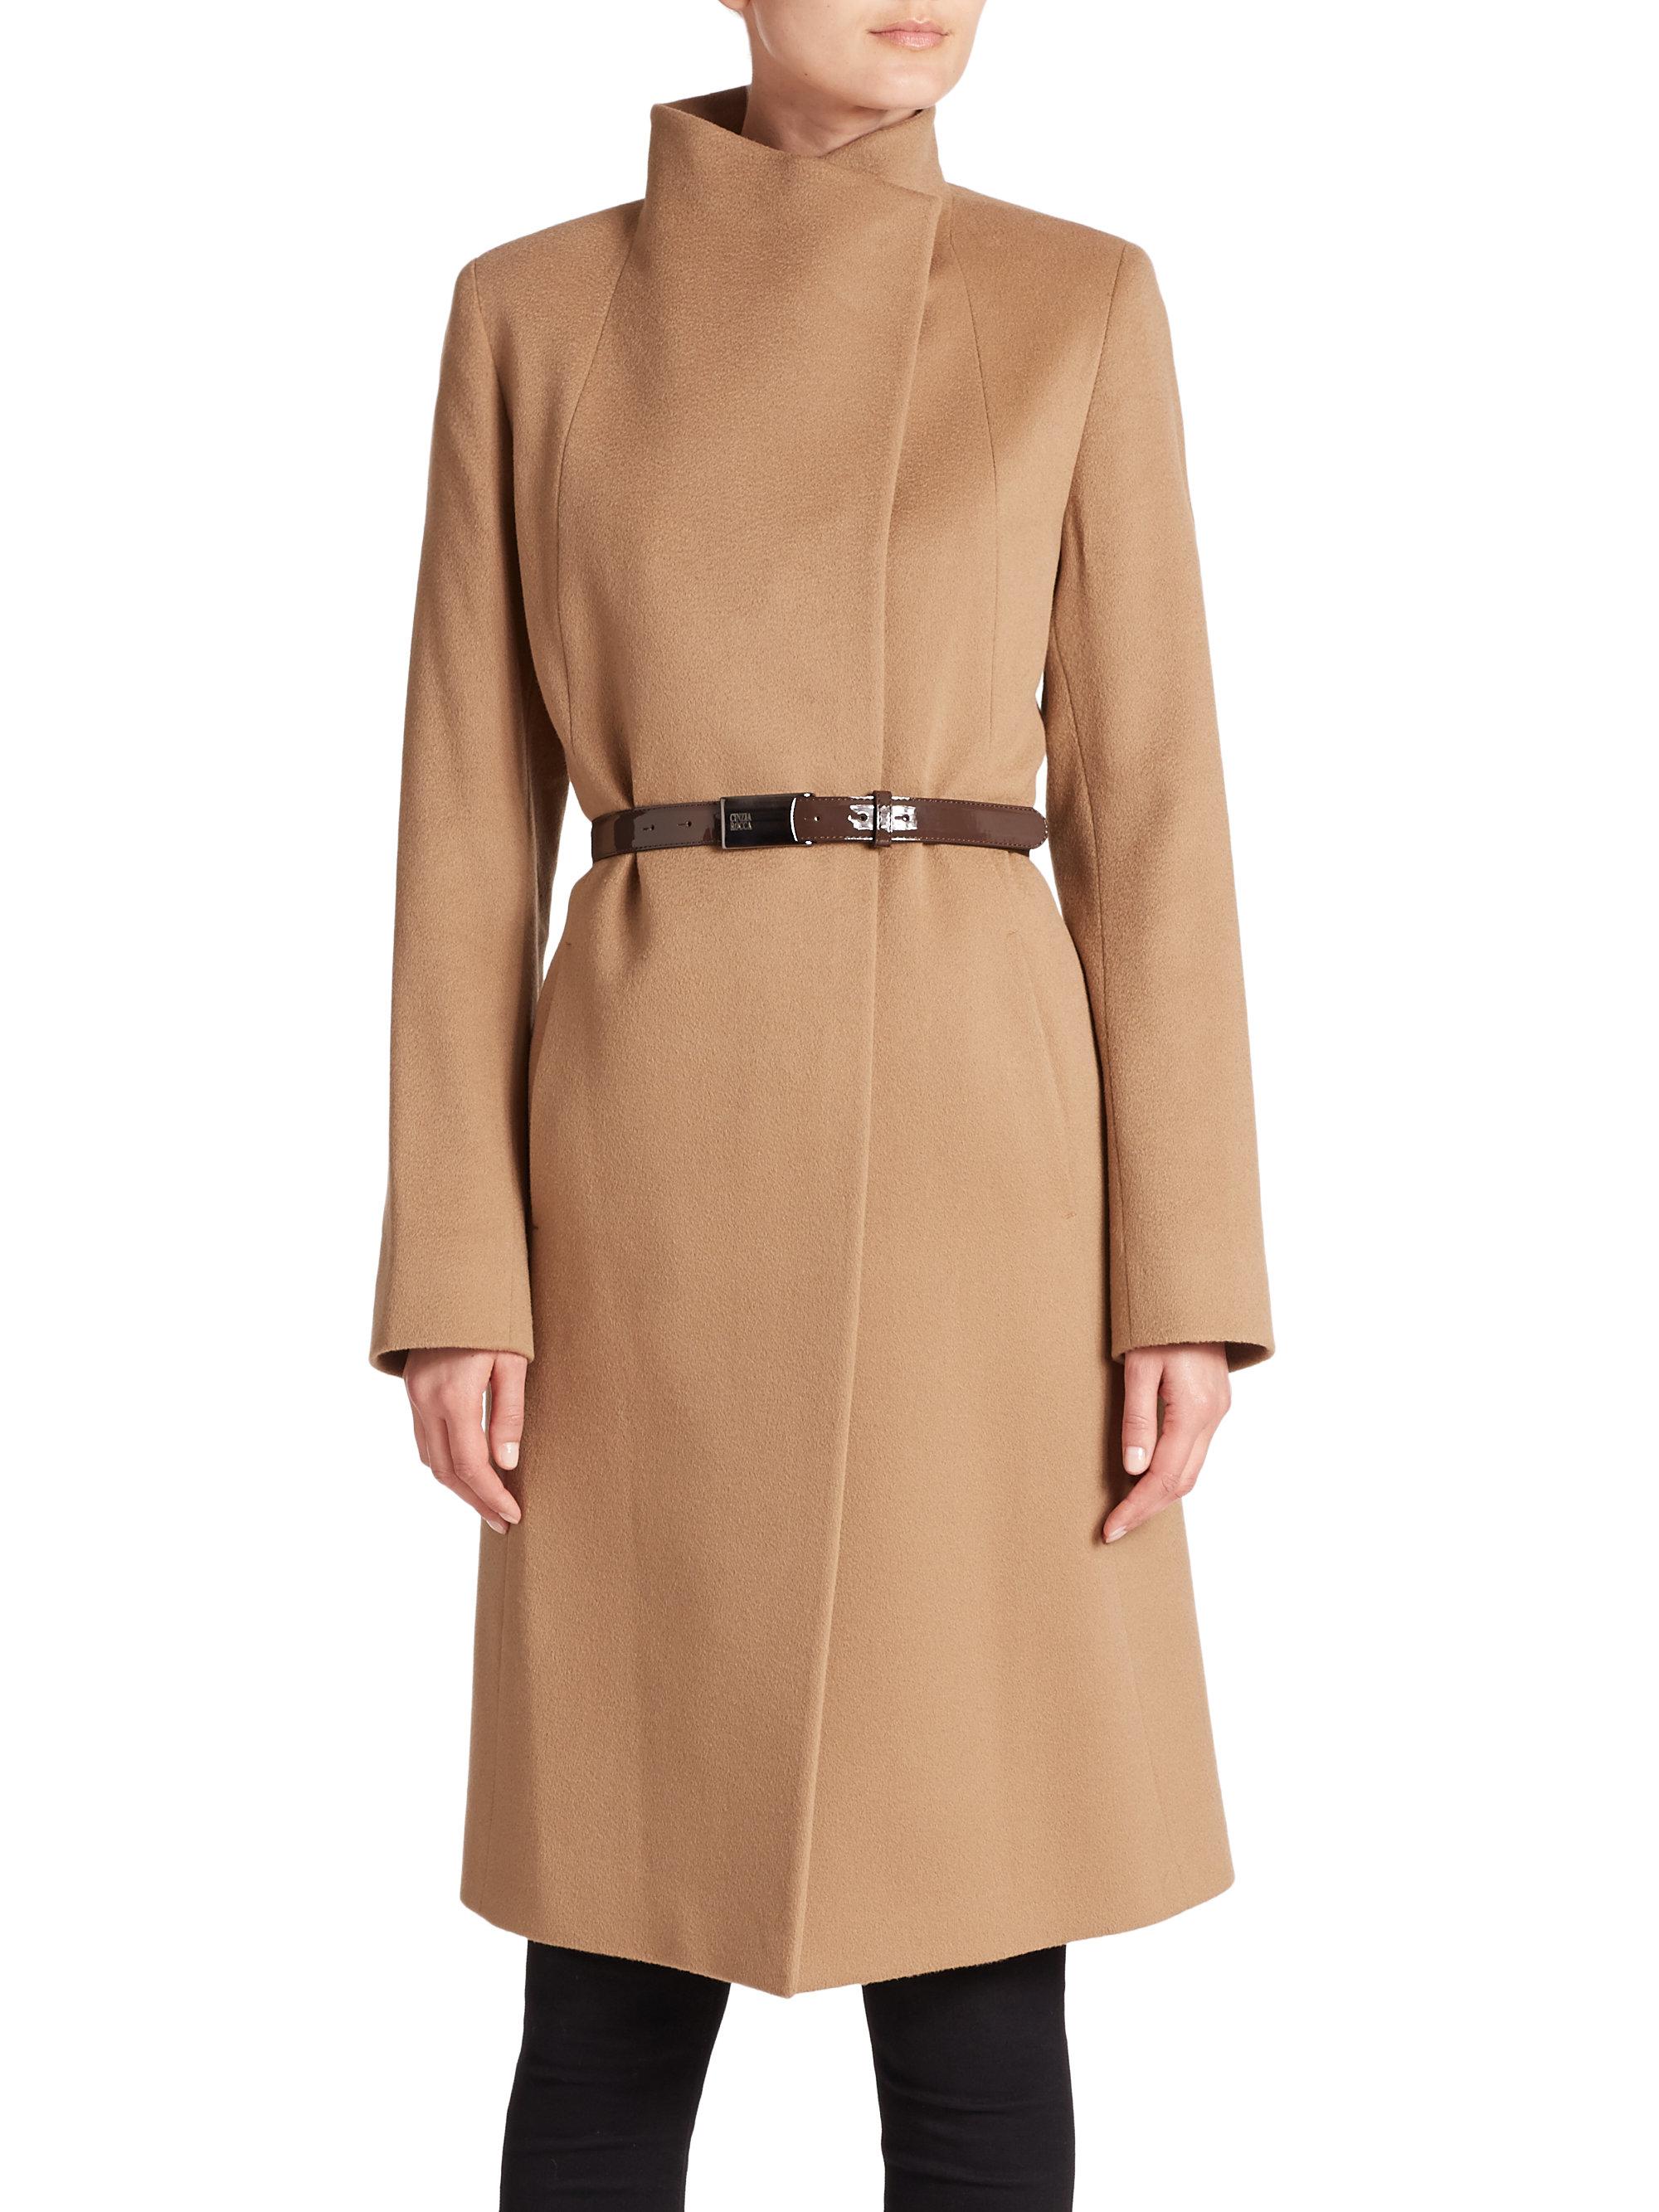 Cinzia rocca Belted Cashmere Coat in Natural | Lyst